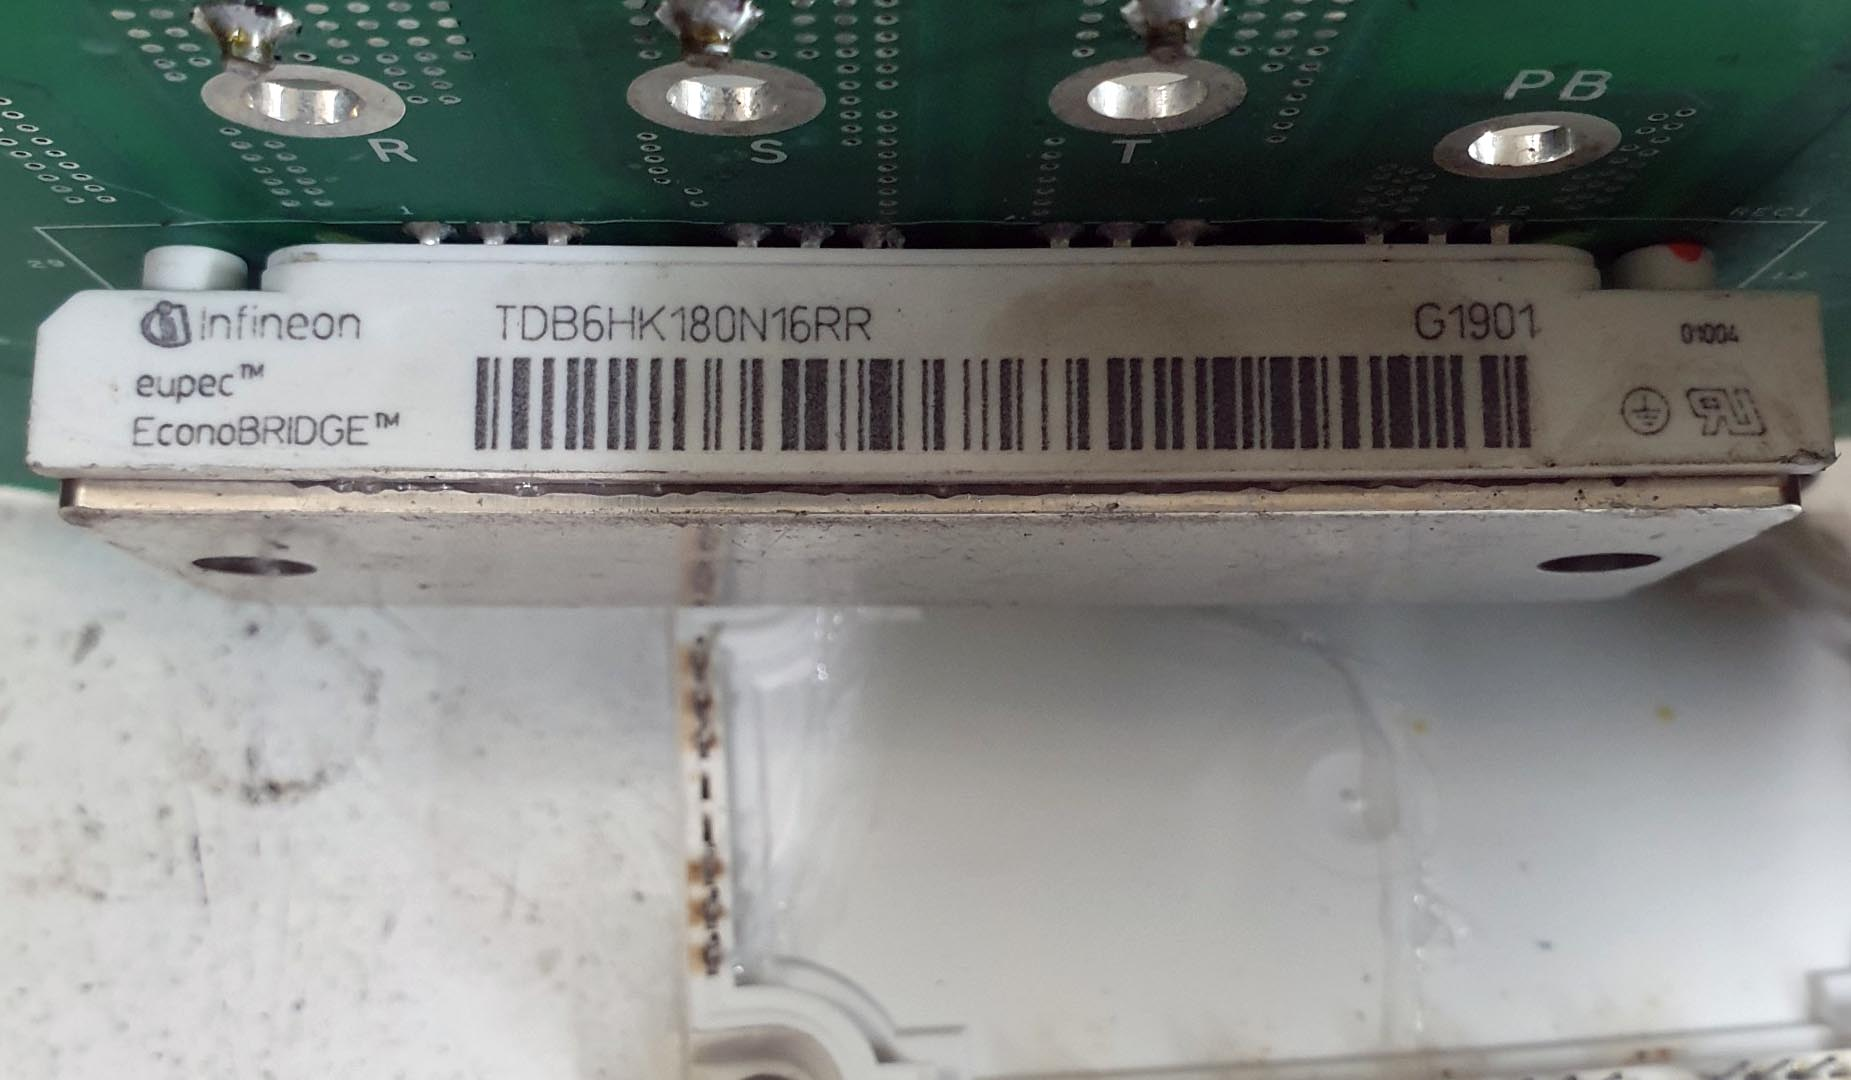 tdb6hk180n16rr-diode-cau-chinh-luu-igbt-180a-1600v